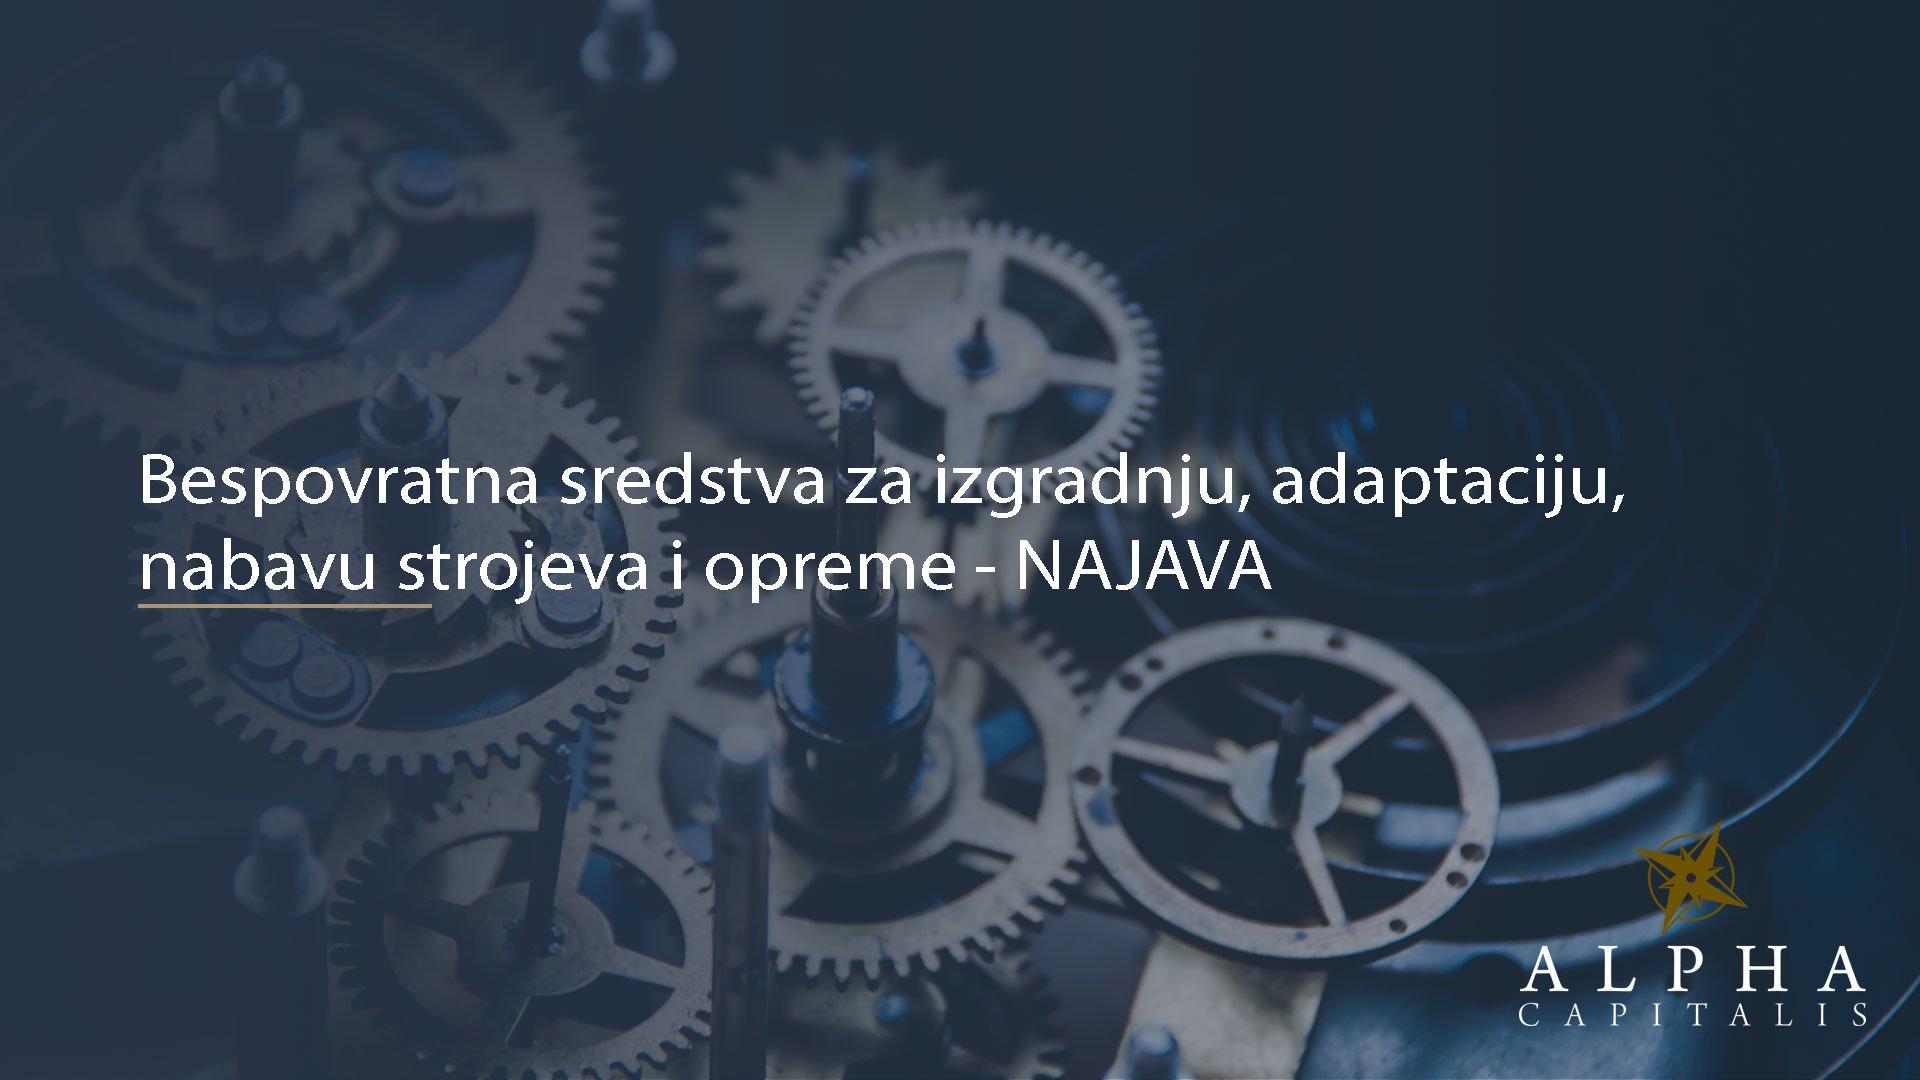 novosti_bespovratna sredstva-